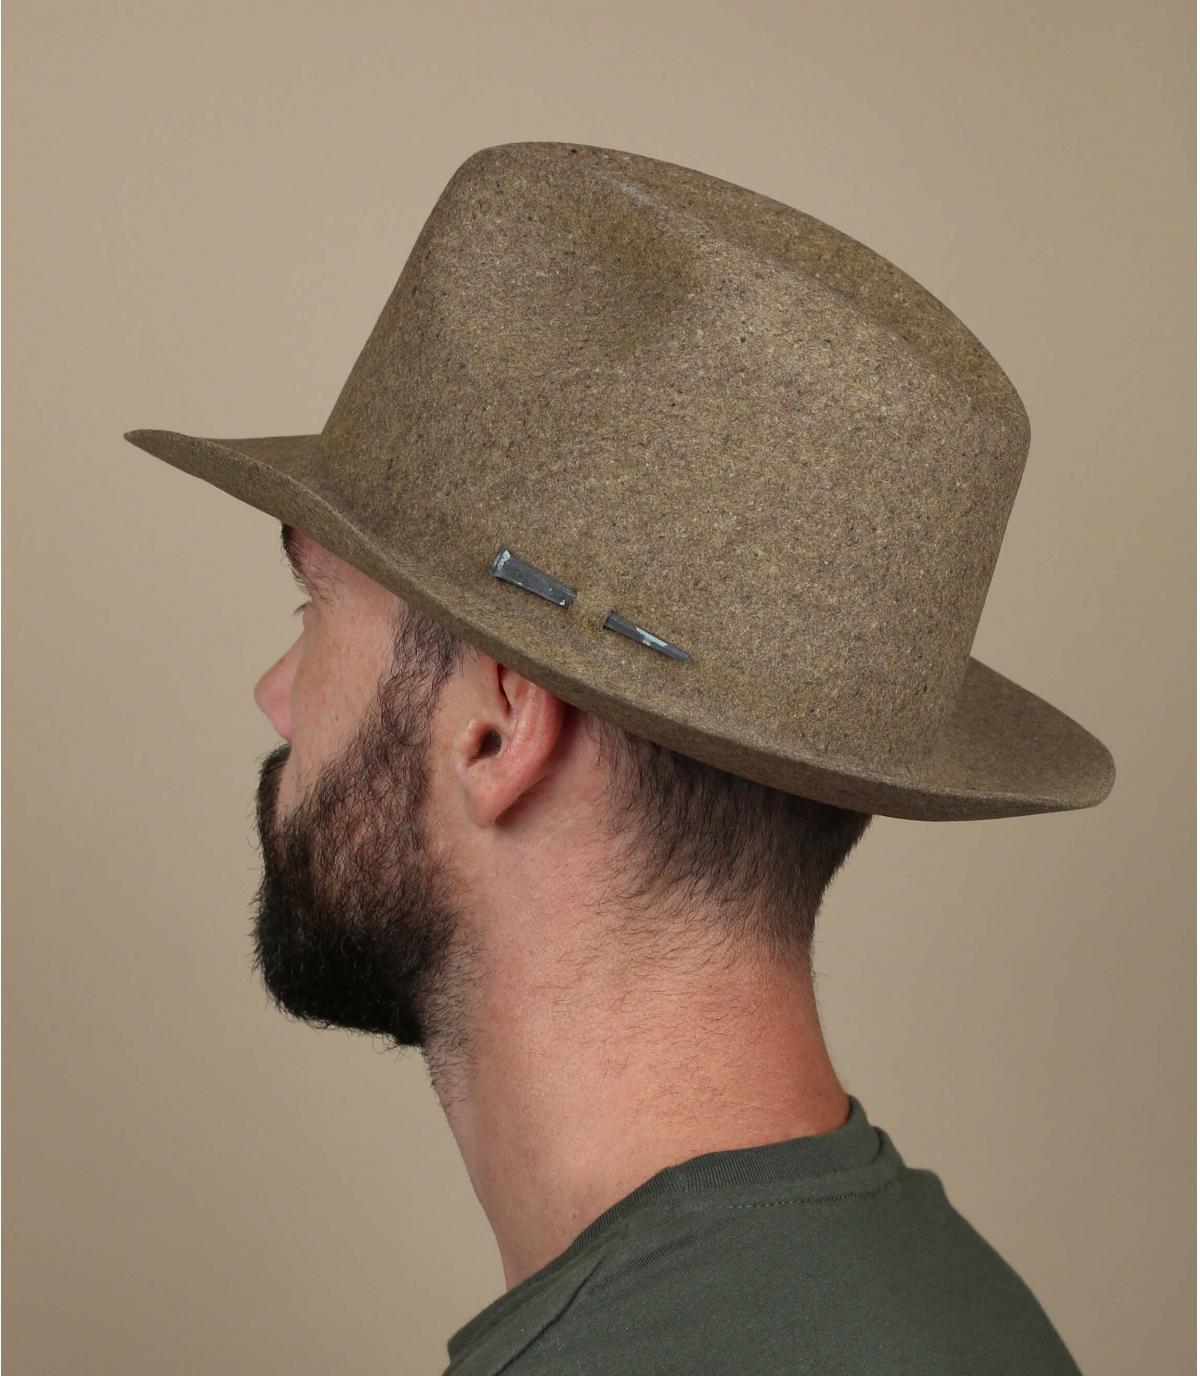 Chapeau sans ruban